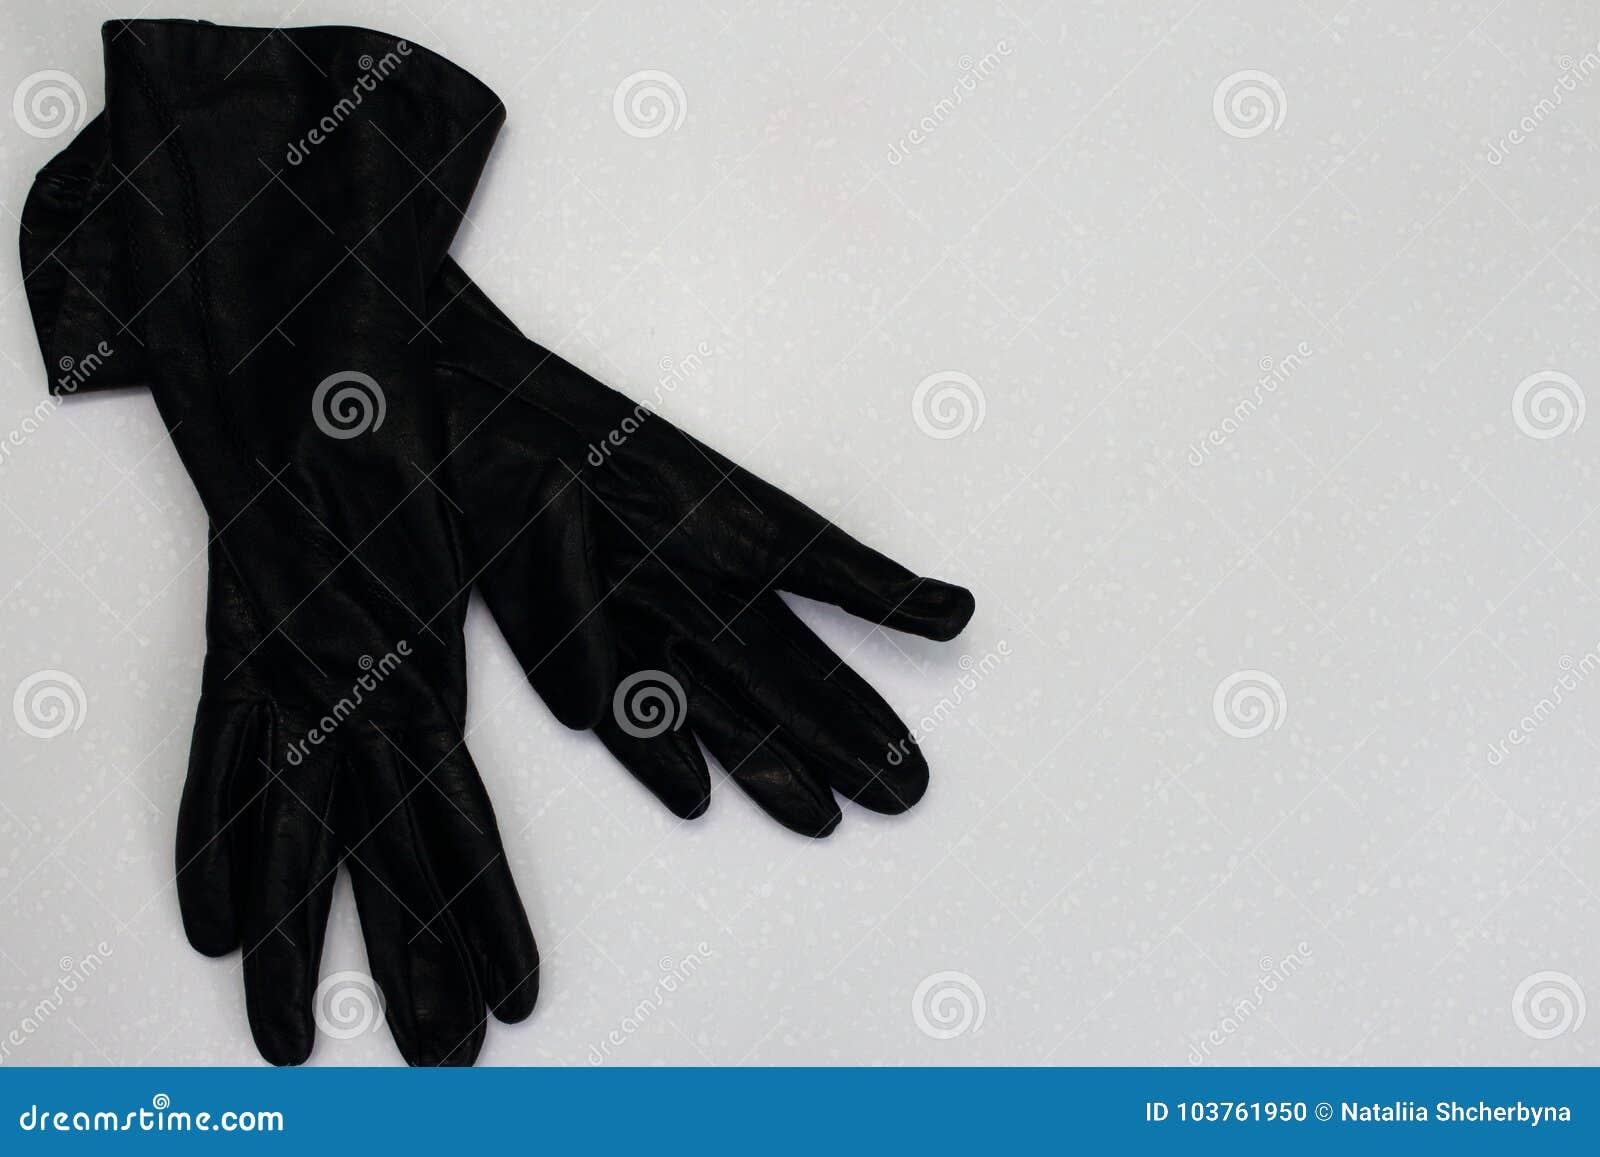 fc2e9f1b1 Pair of women black leather gloves isolated on white background as women  elegant autumn winter fashion